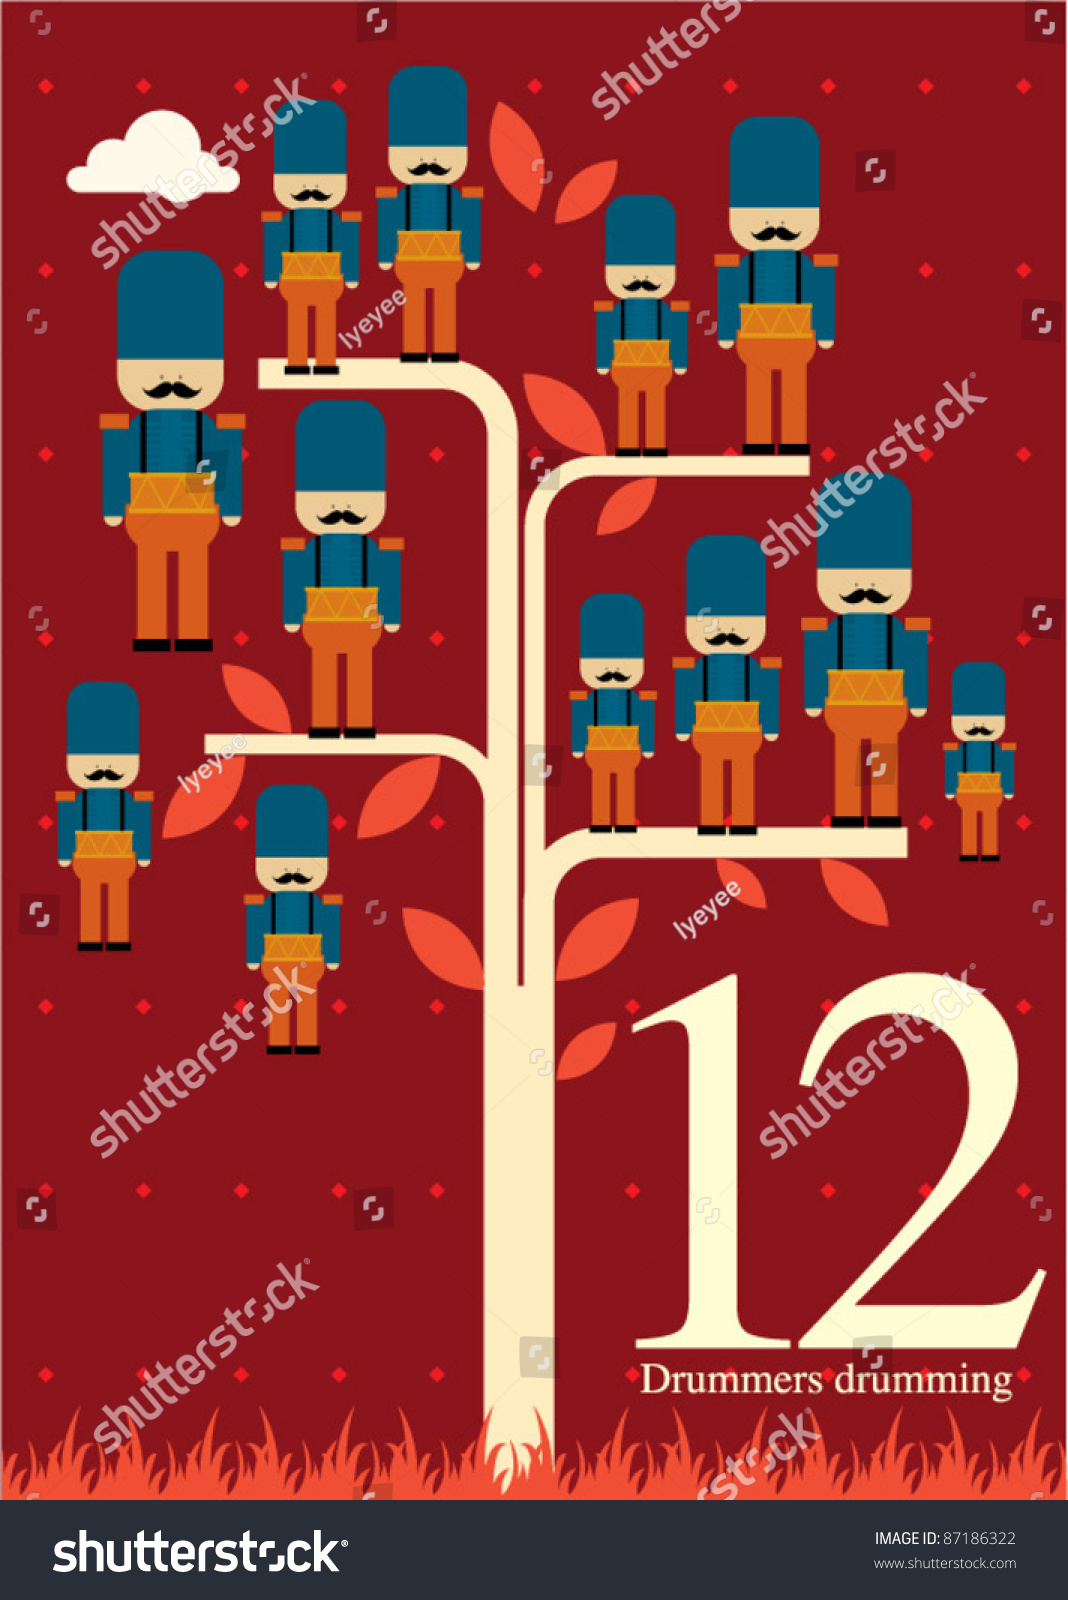 The Twelve Days Of Christmas - Twelfth Day Of Christmas - Twelve Drummers Drumming Stock Vector Illustration 87186322 : Shutterstock